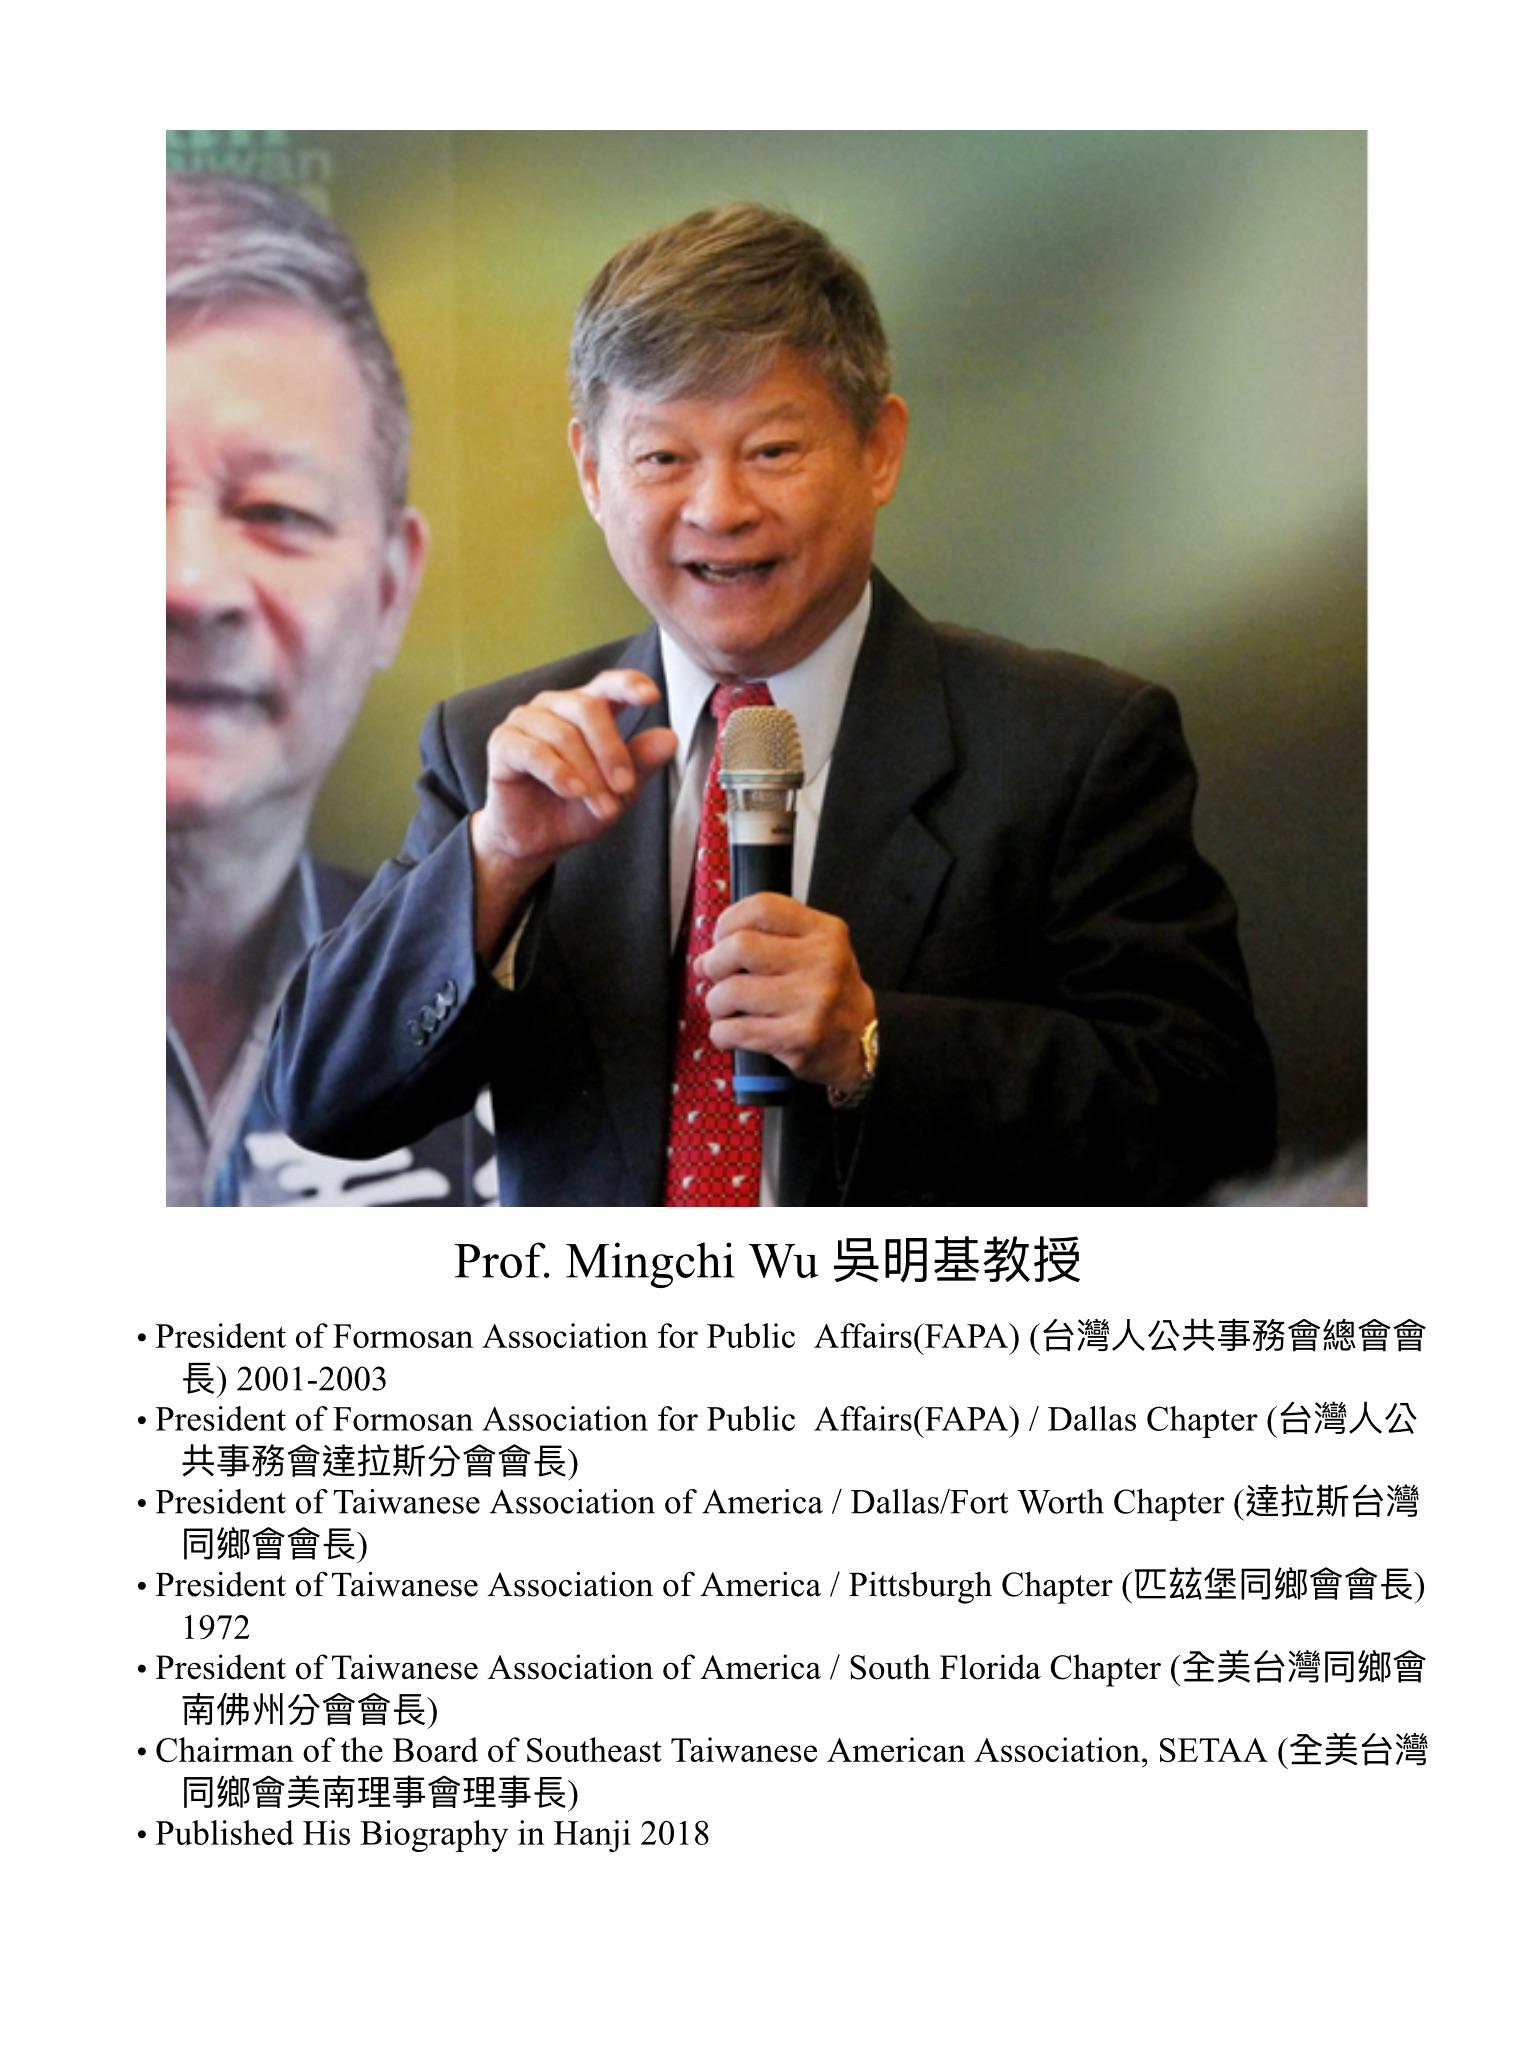 203. Prof. Mingchi Wu 吳明基教授